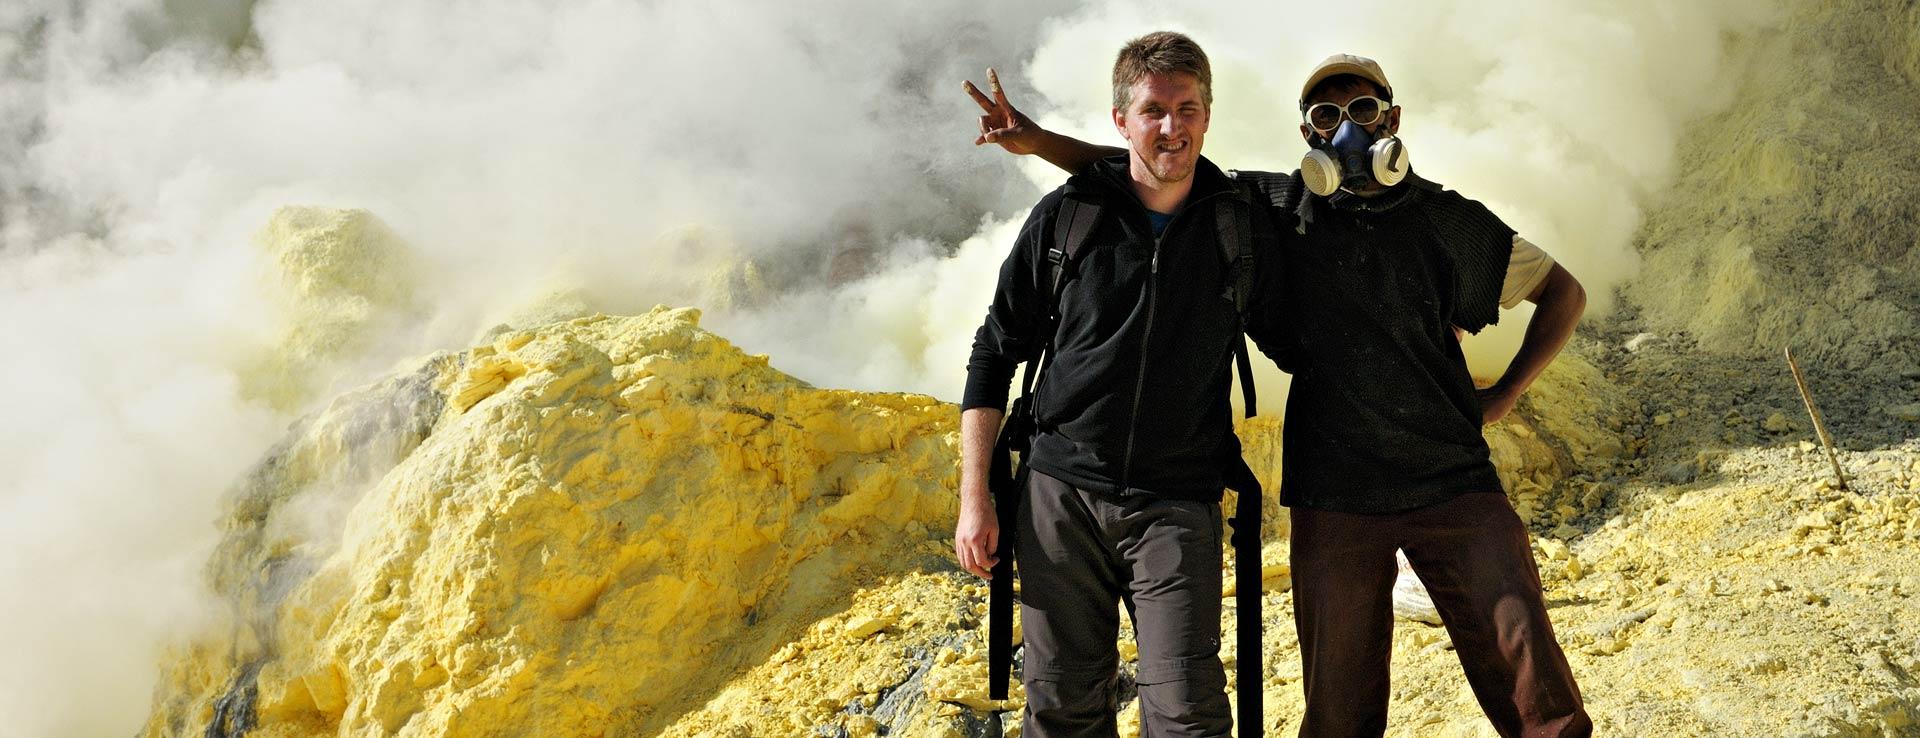 Pascal Boegli sur le volcan Kawah Ijen, Indonésie